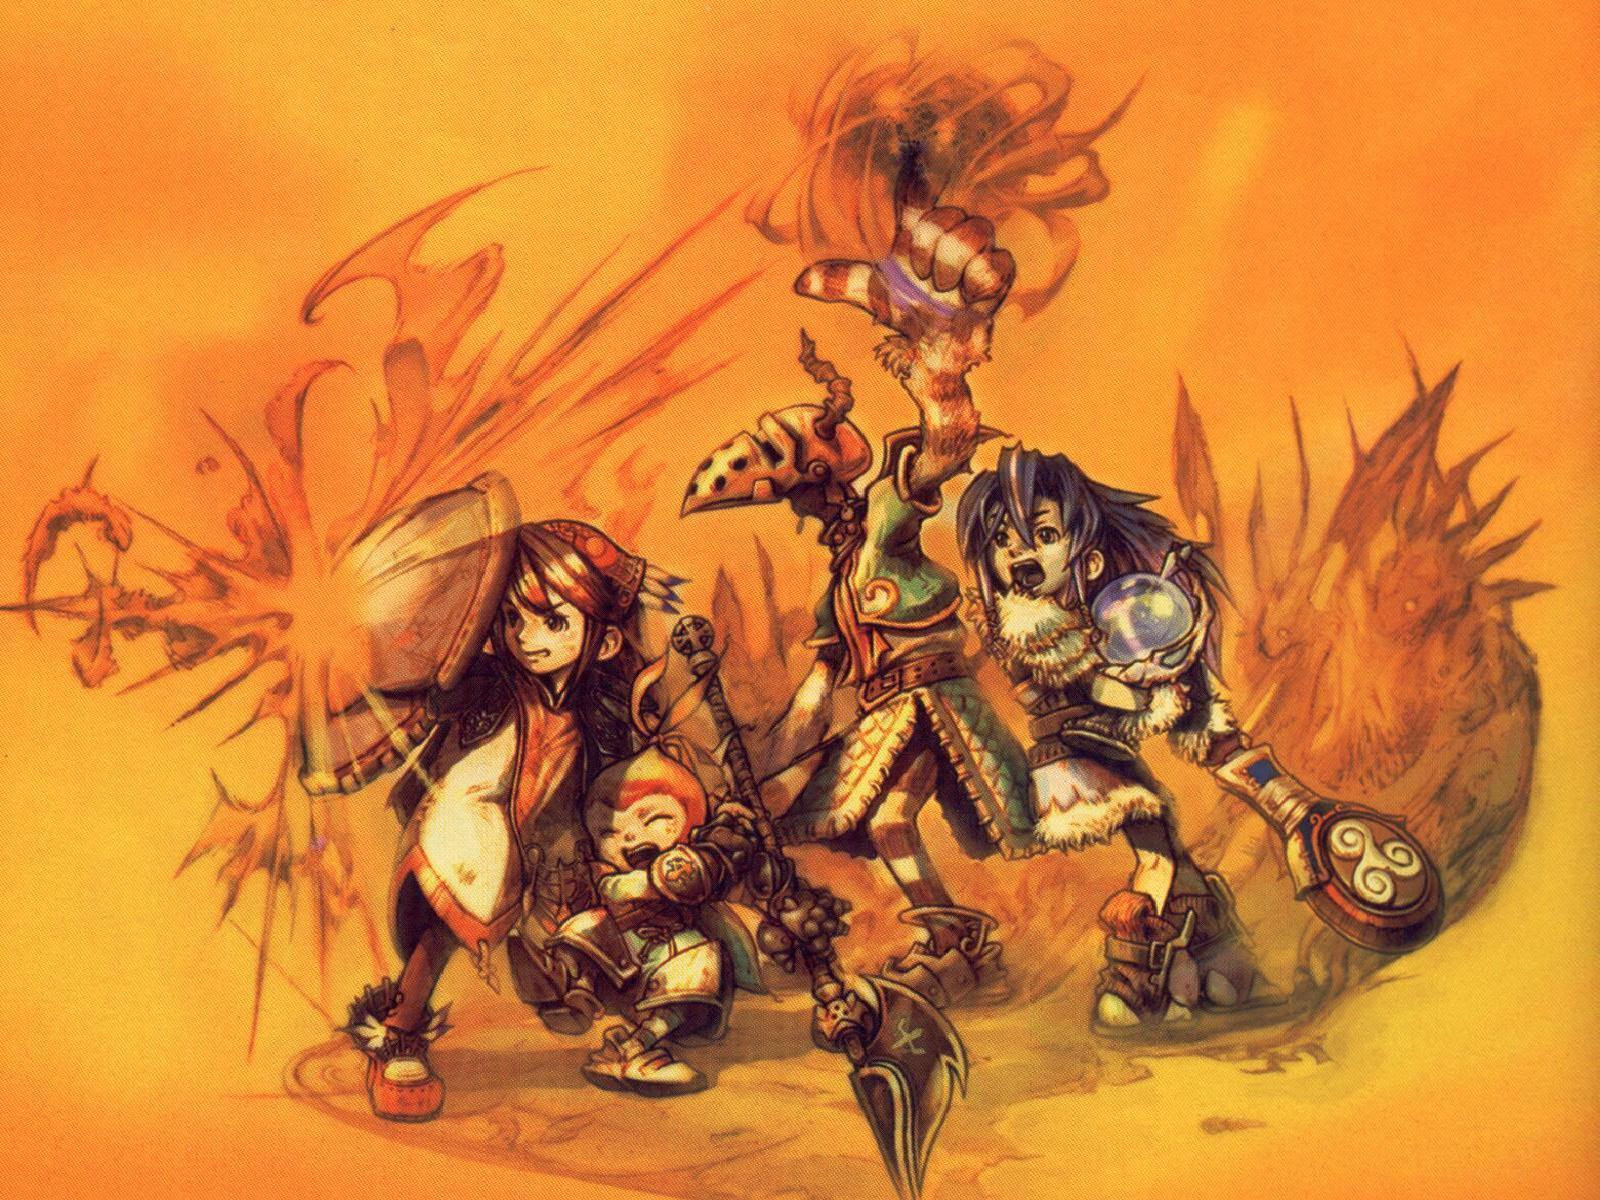 Final Fantasy Crystal Chronicles Wallpaper Chronicle Minitokyo